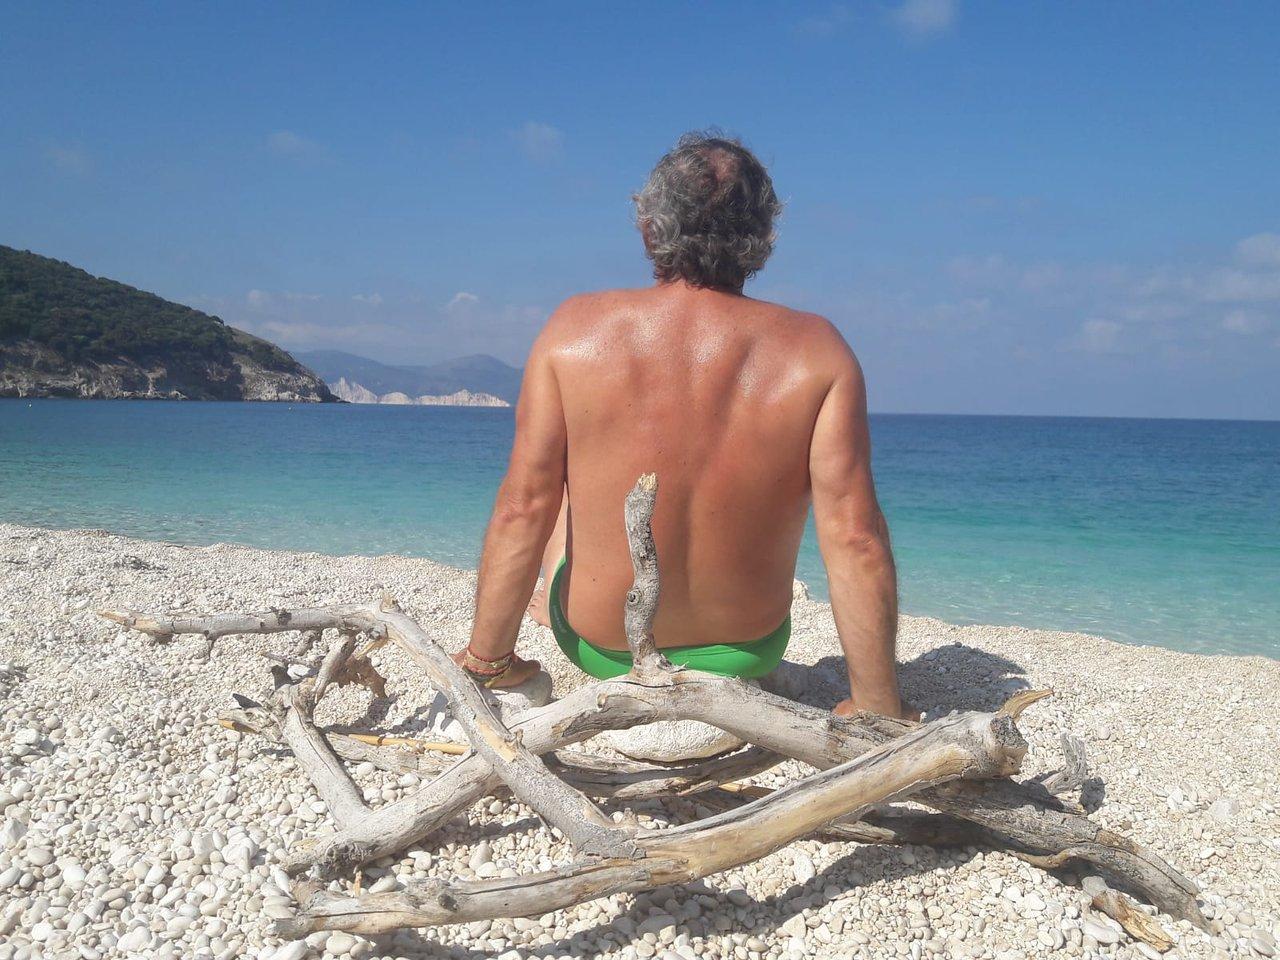 Skala 2020 Best Of Skala Greece Tourism Tripadvisor